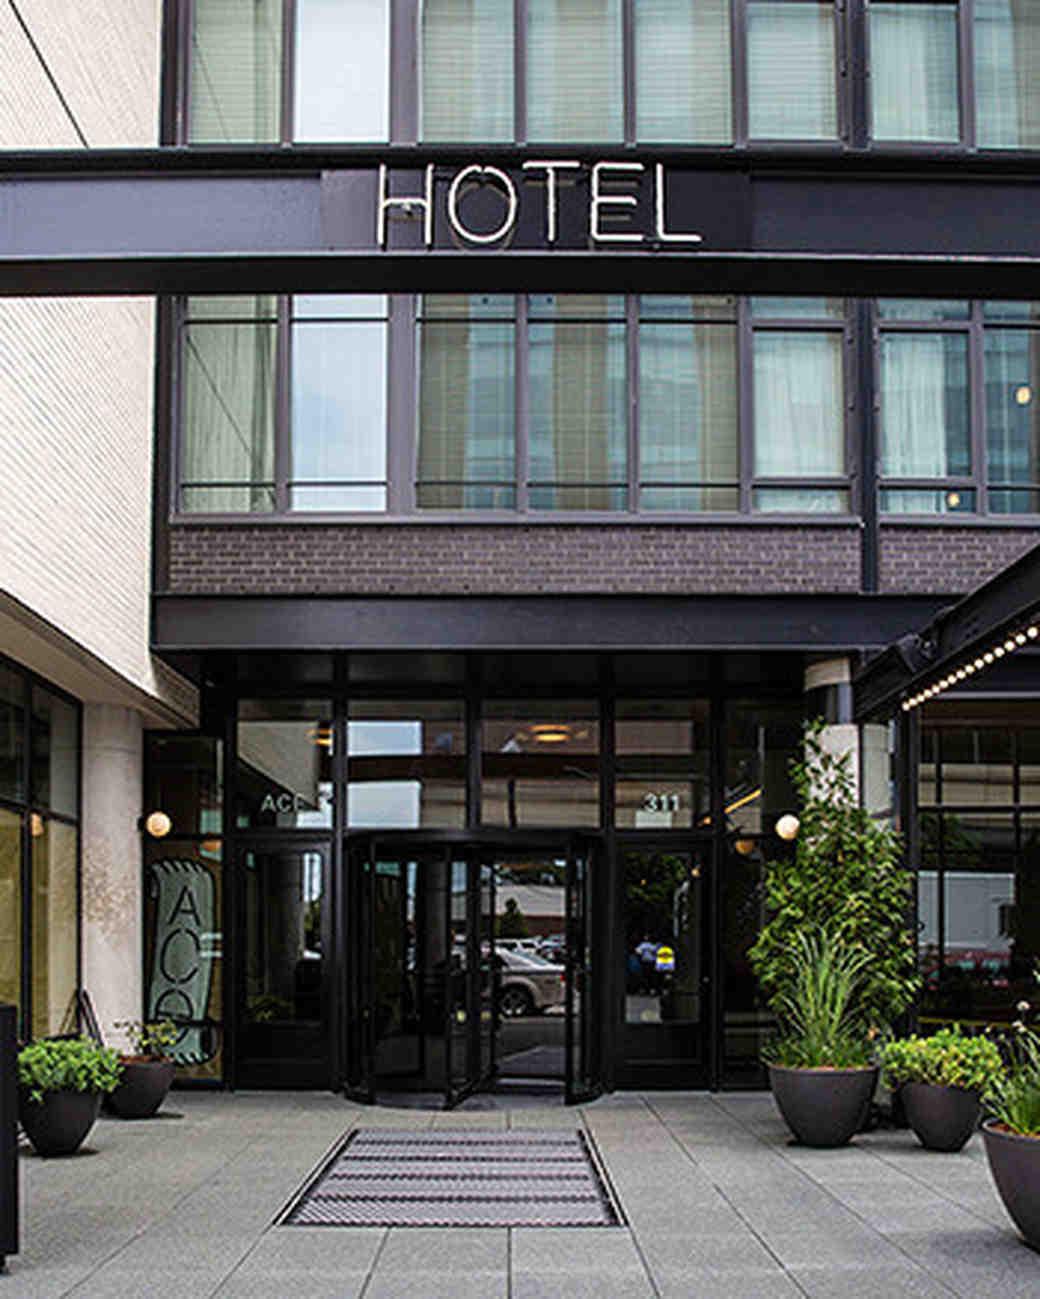 new venue hotel exterior